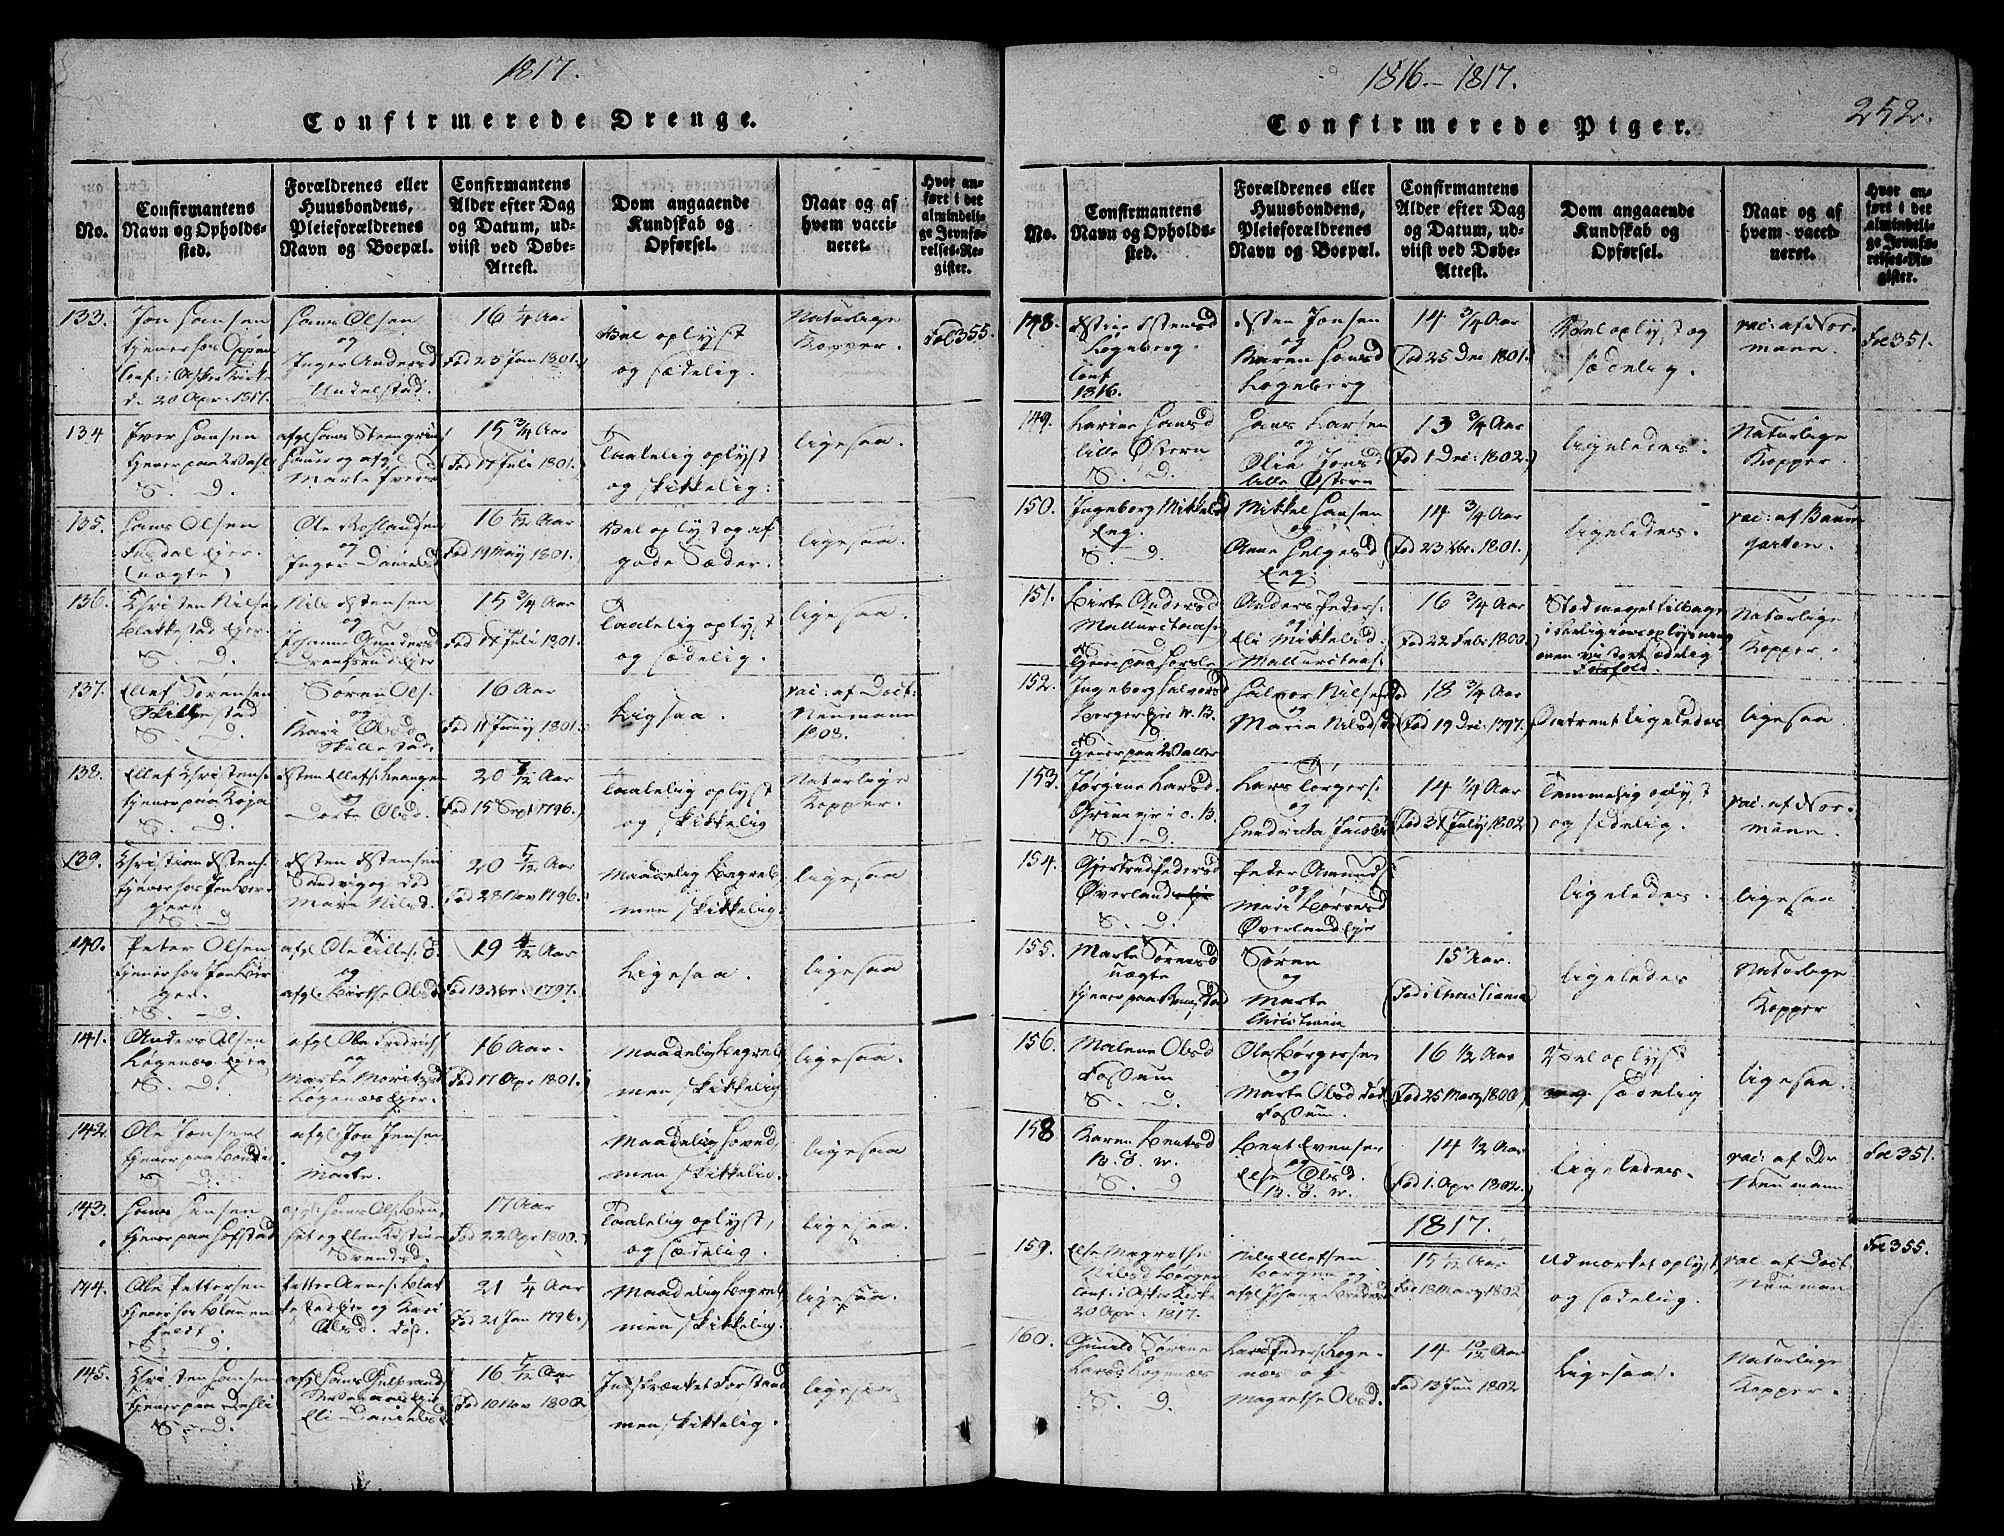 SAO, Asker prestekontor Kirkebøker, G/Ga/L0001: Klokkerbok nr. I 1, 1814-1830, s. 252